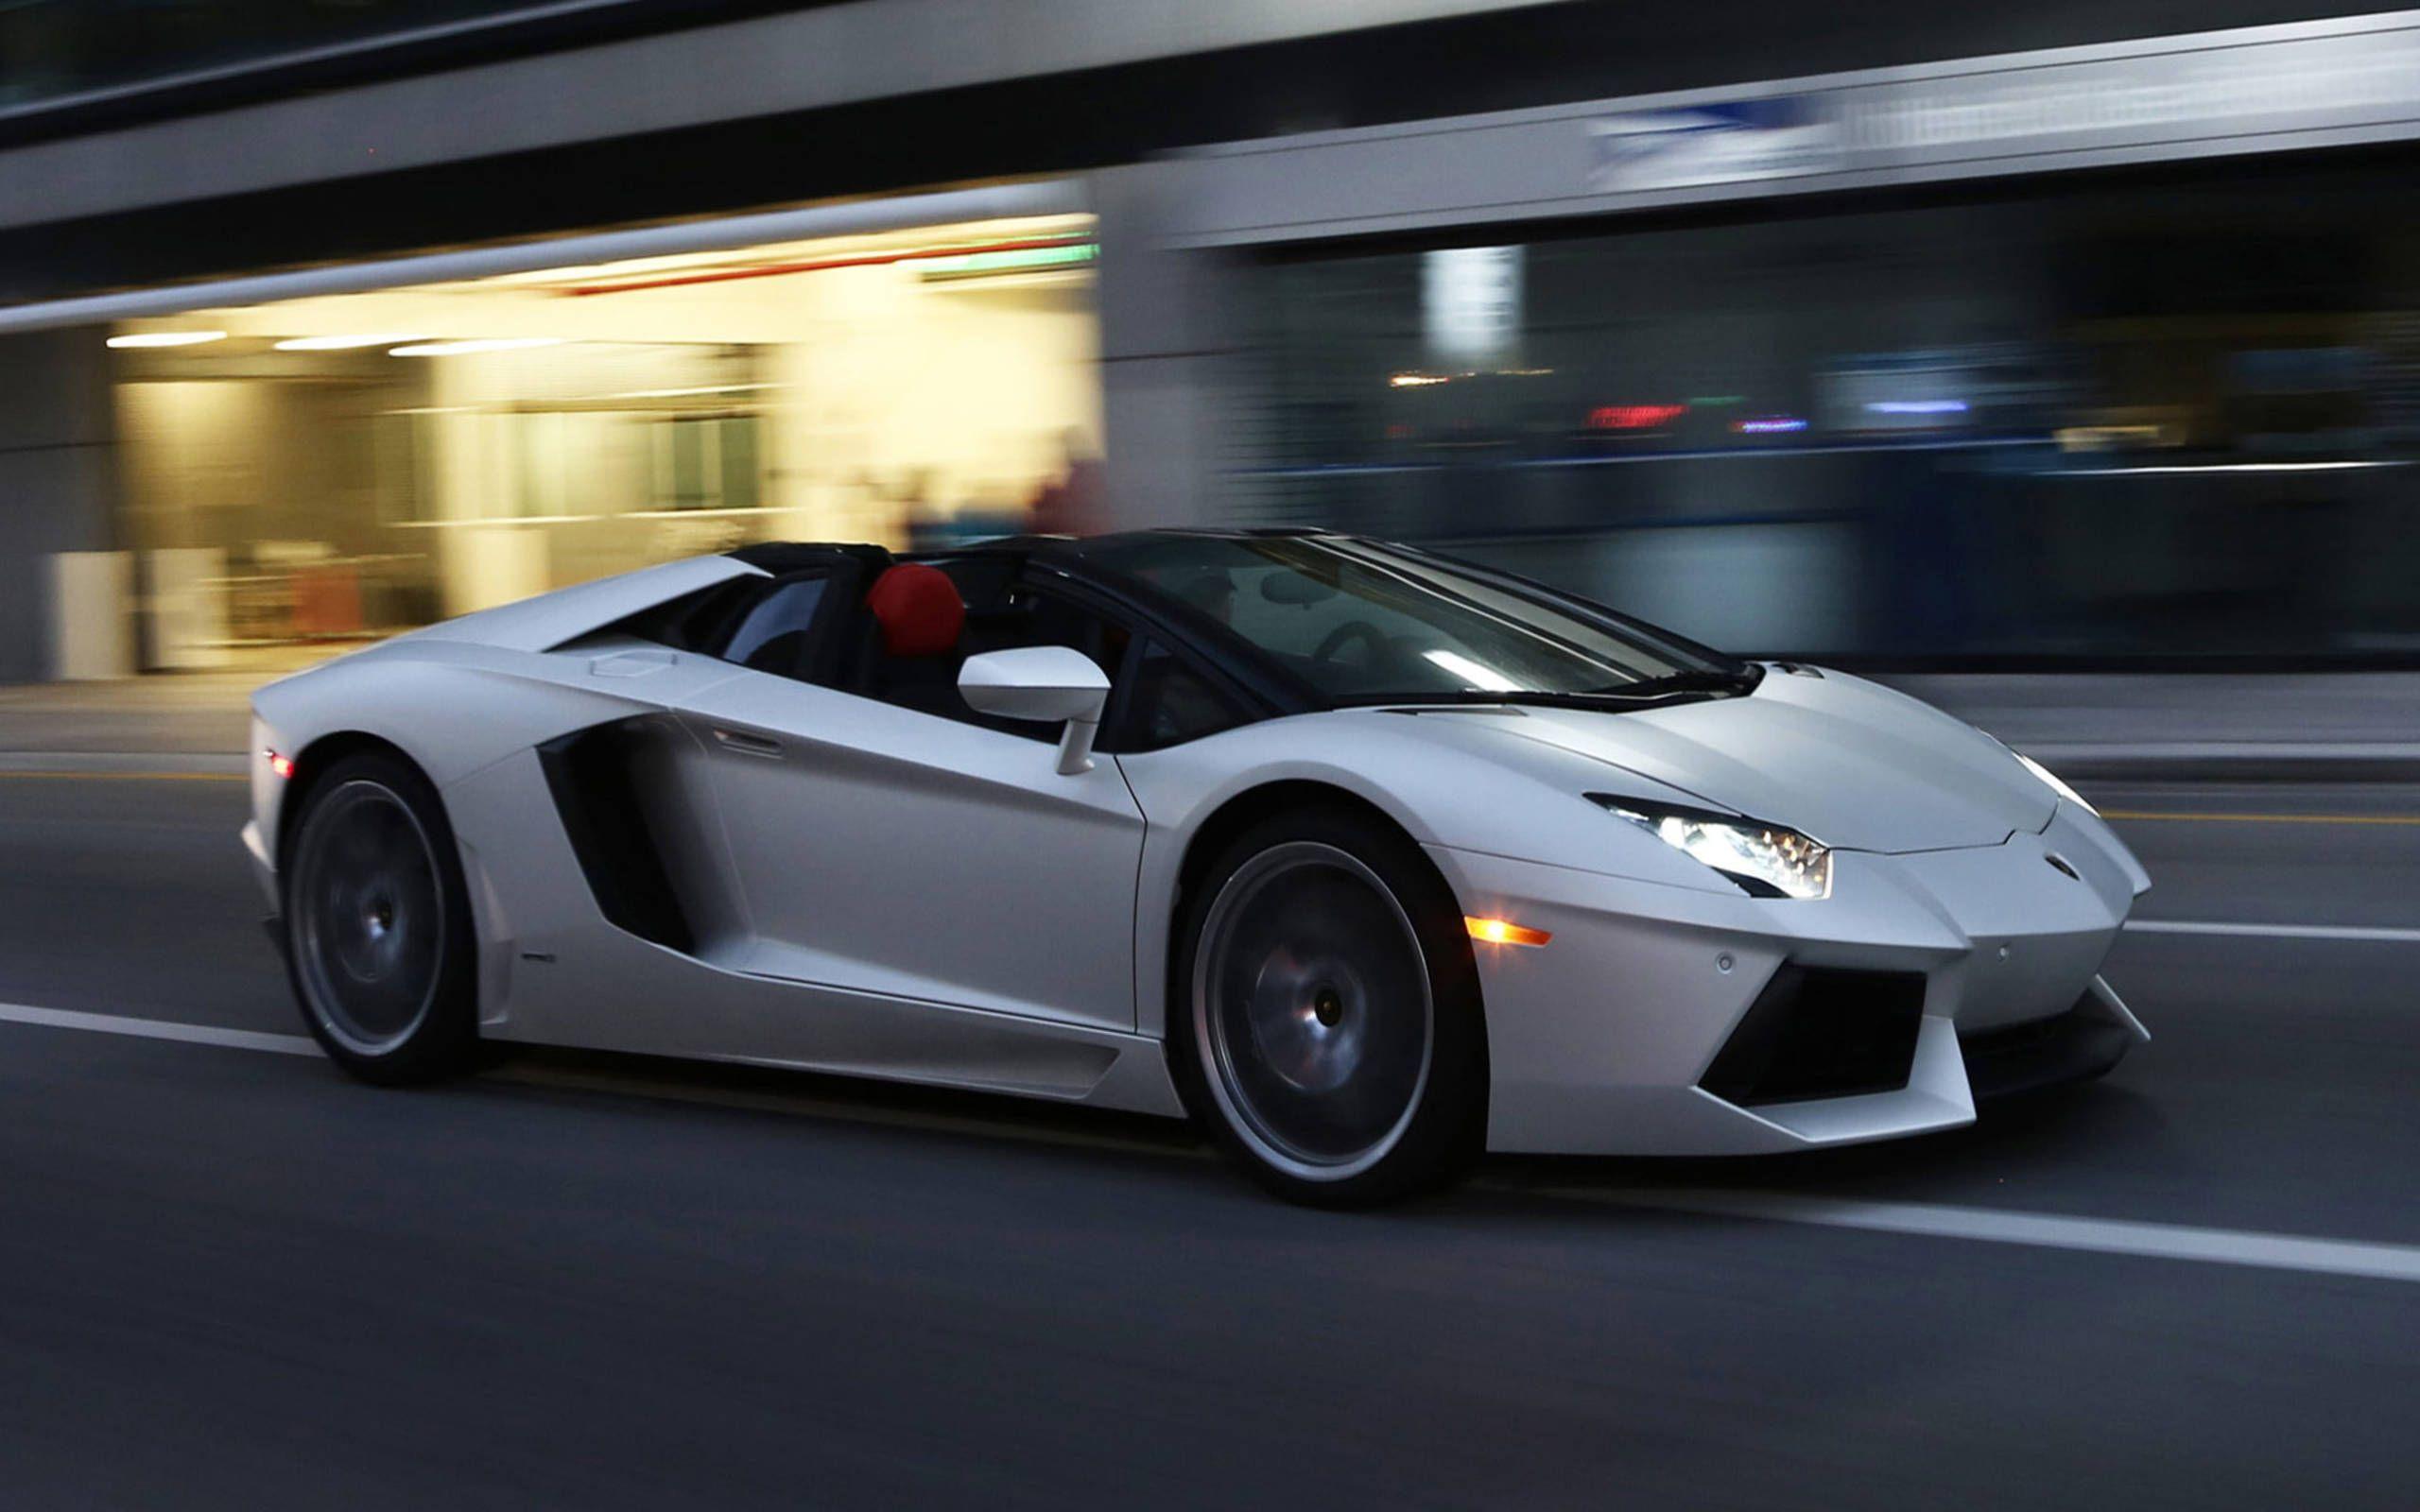 Lamborghini Aventador Sv Roadster Drops Its Top Gets Even More Insane